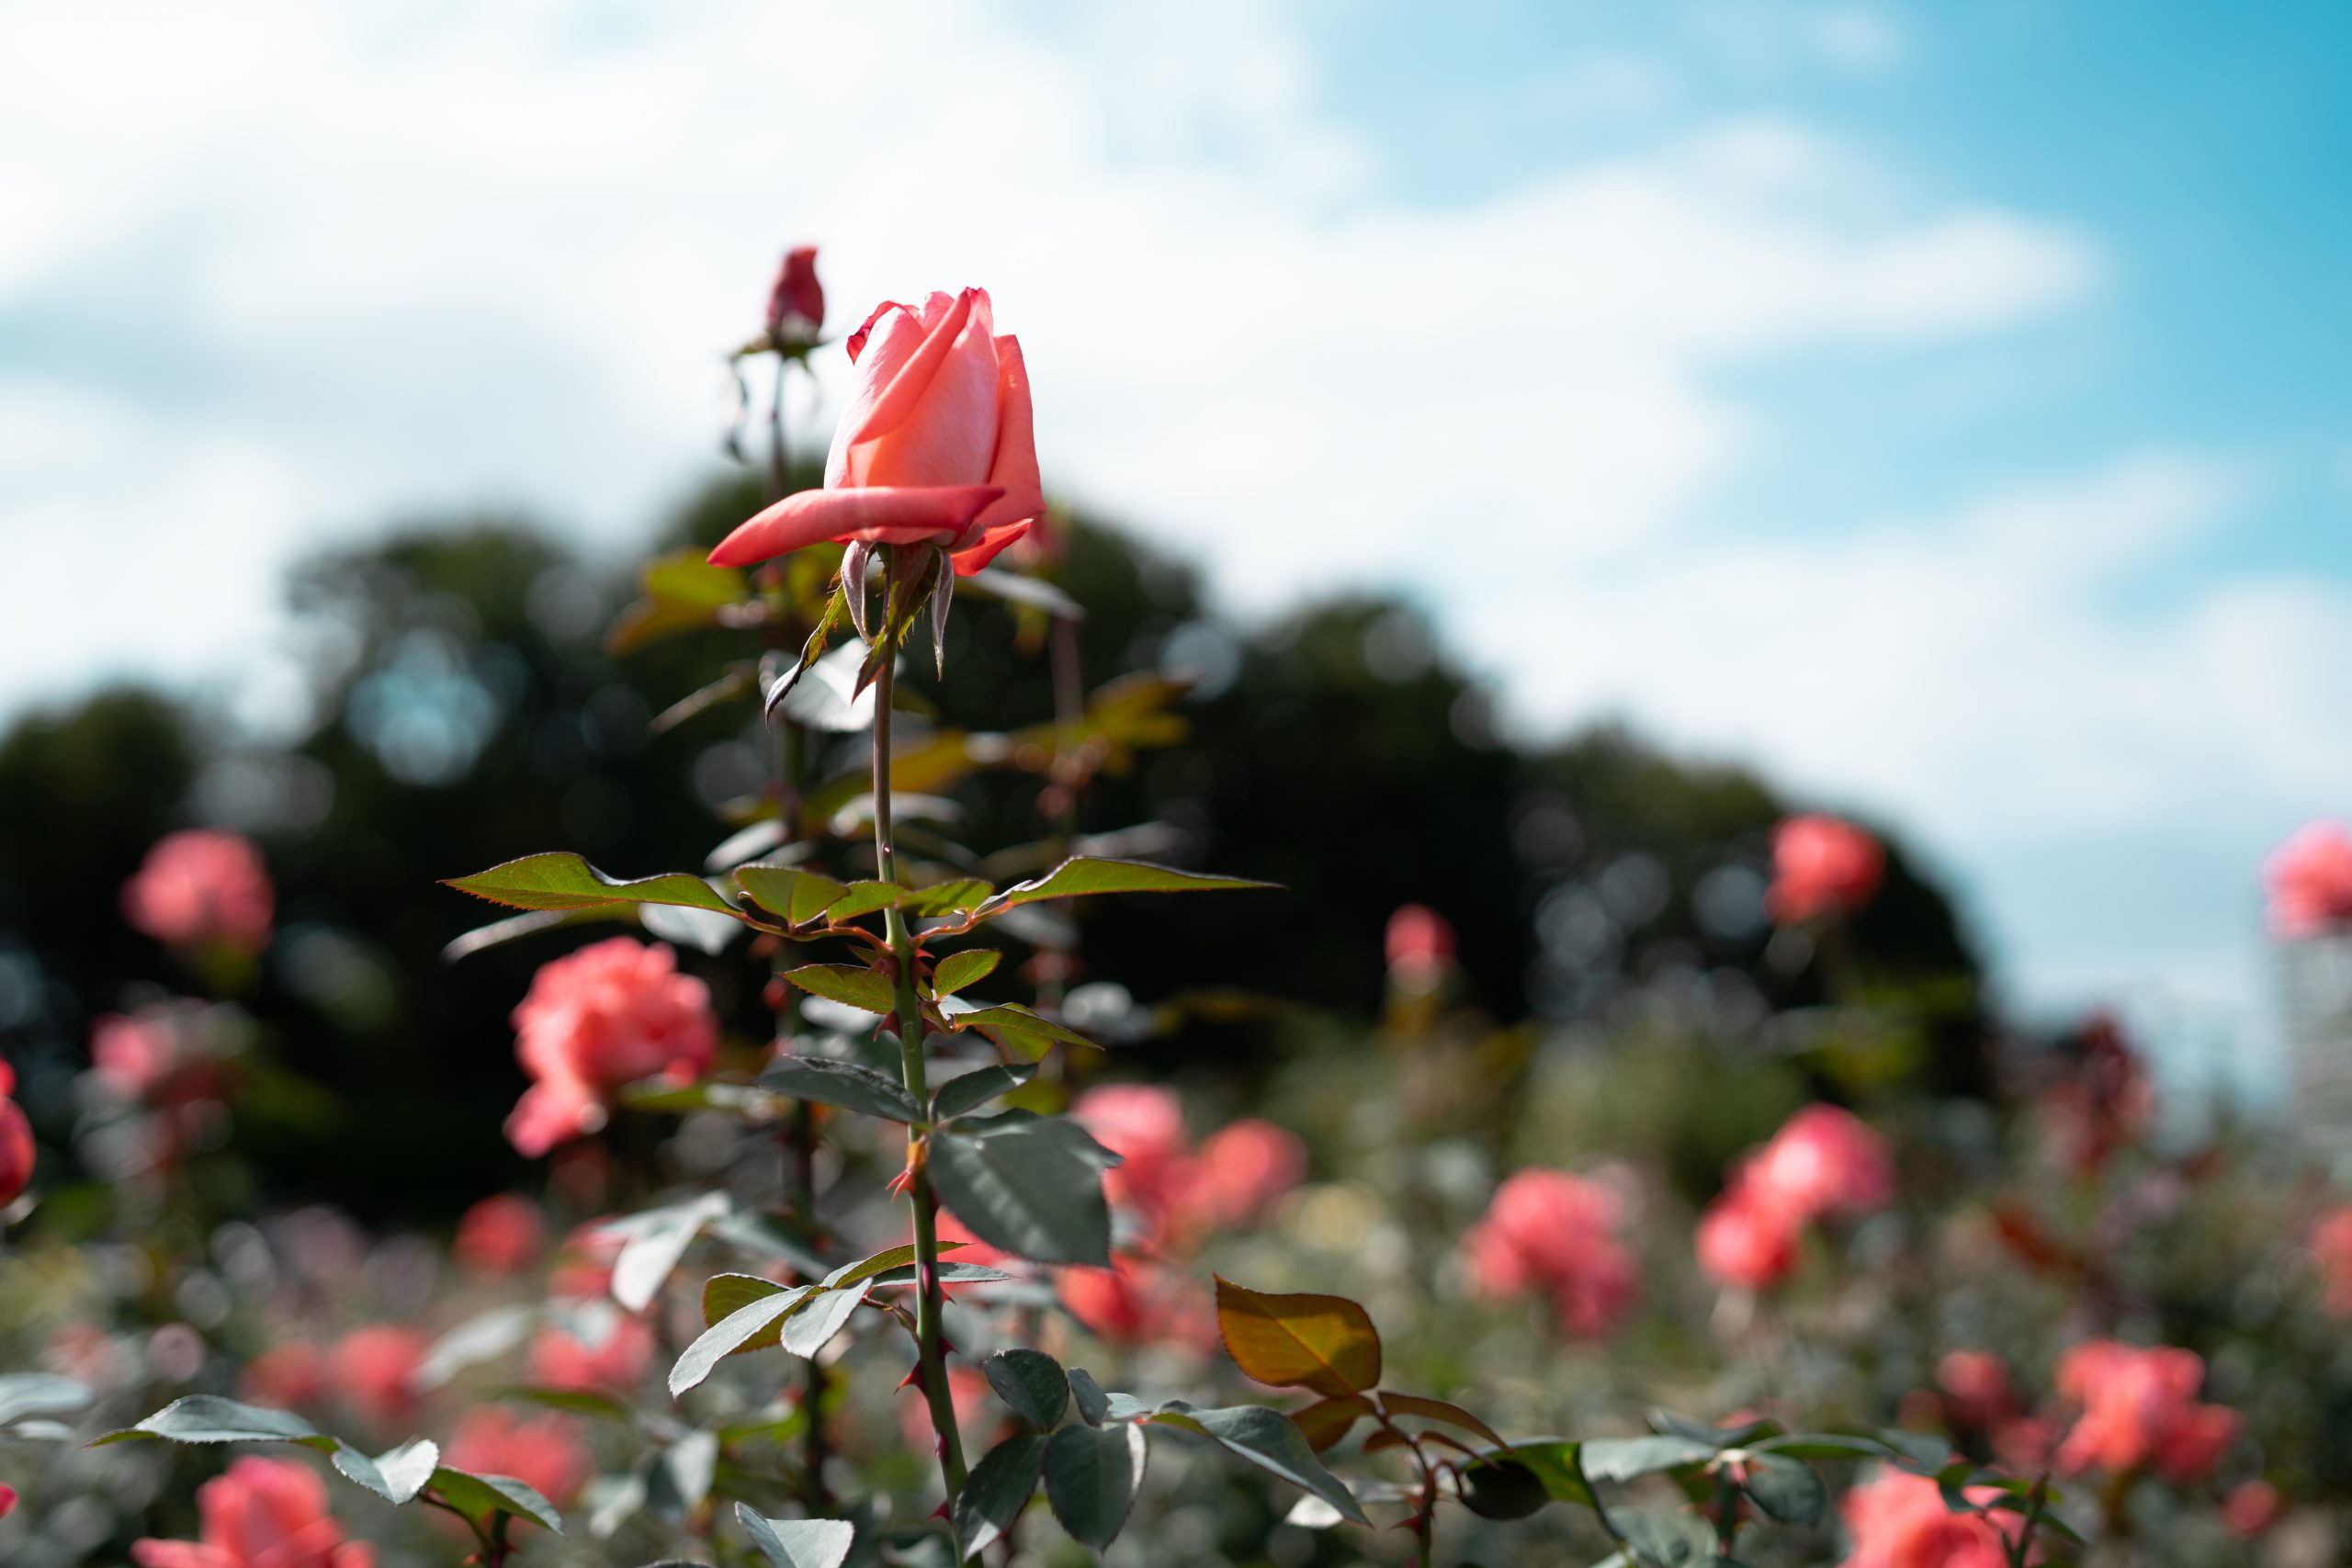 【SONY】Batisで撮る秋薔薇